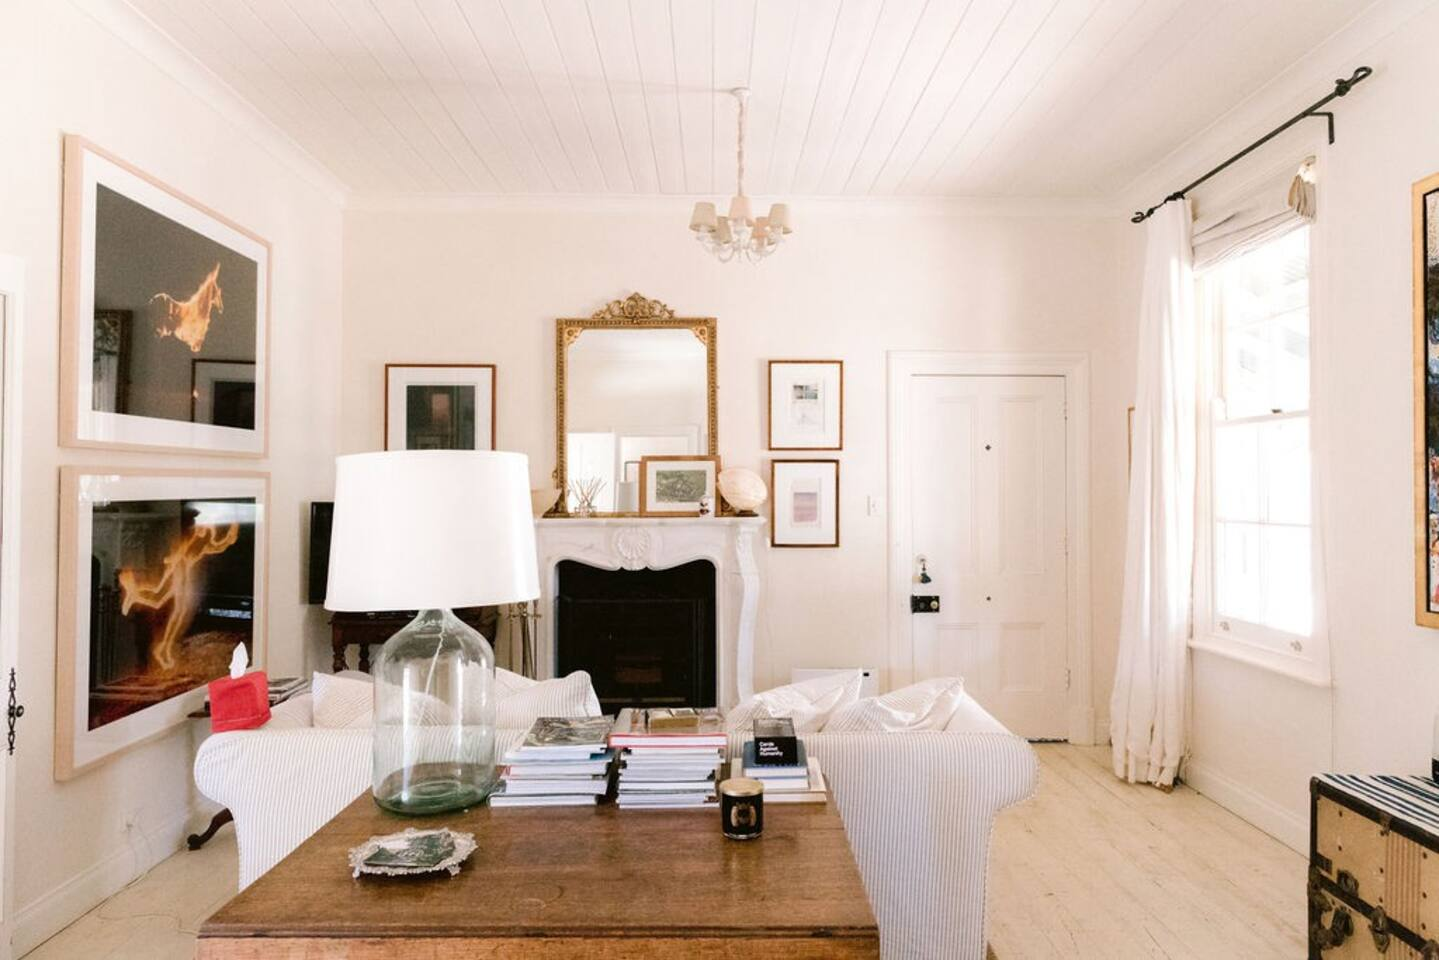 HH-Artists-Cottage-Accommodation-Southern-Highlands-24.jpg